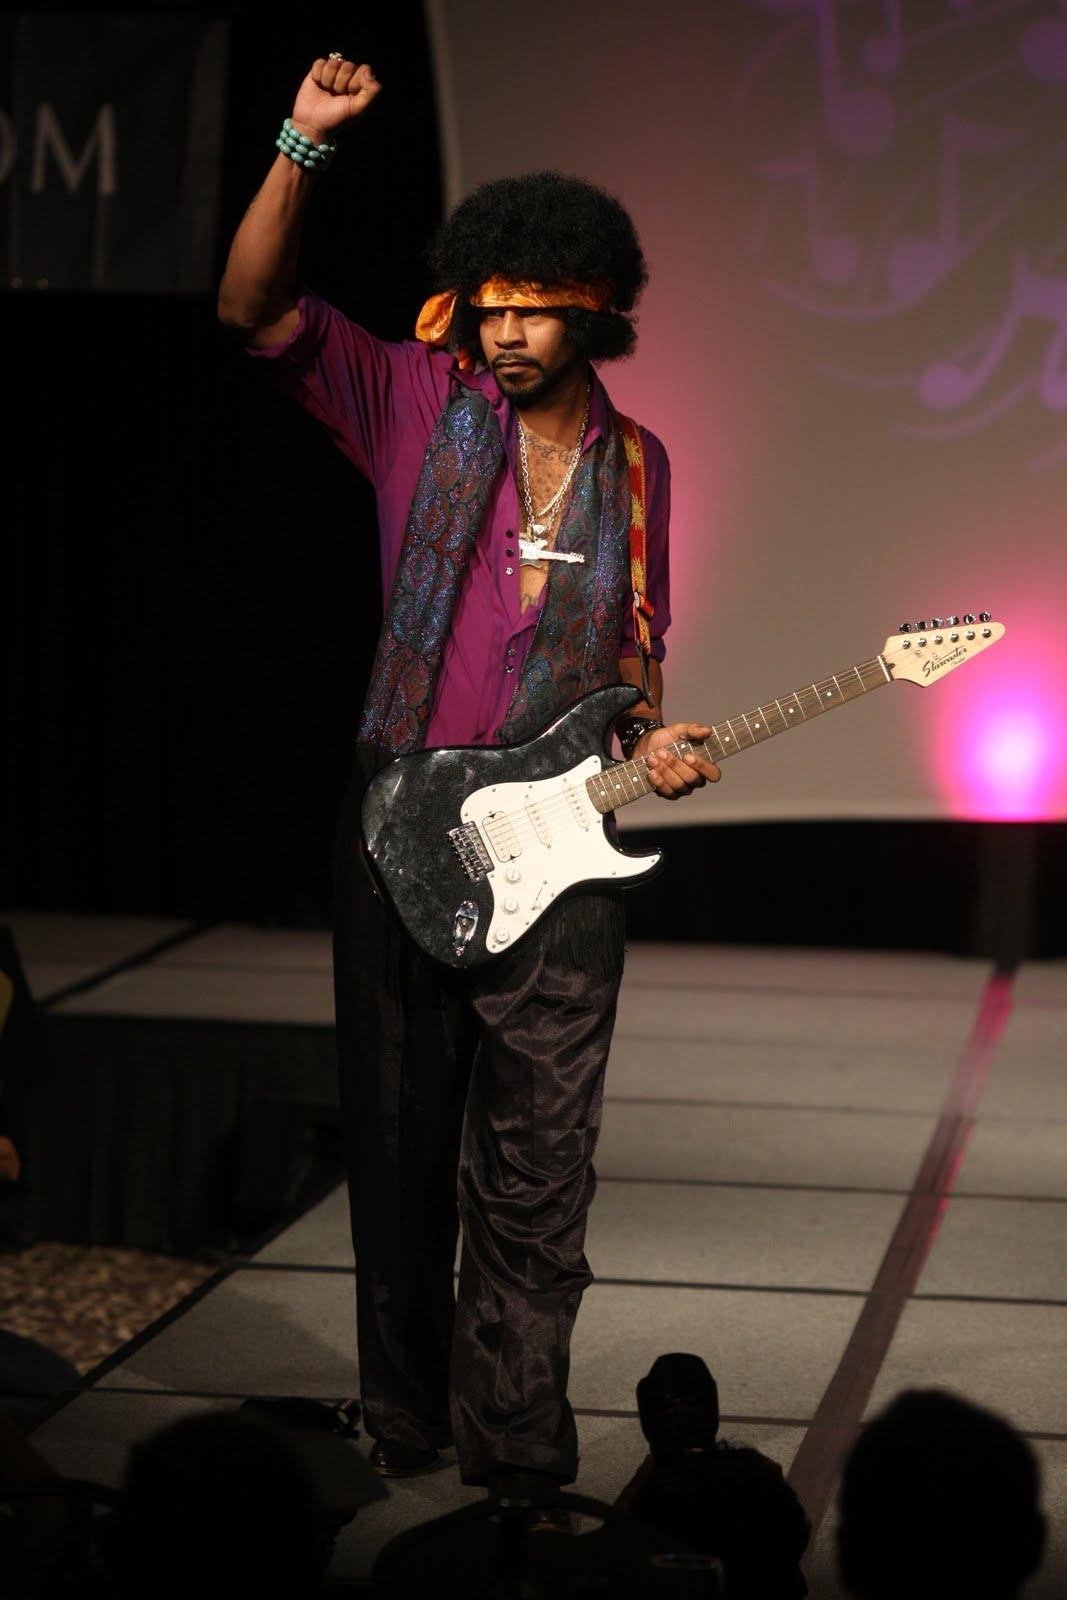 http://4.bp.blogspot.com/_8sEE3QQ02E8/TNR2VetIDlI/AAAAAAAABS8/kUVj1dpVEy4/s1600/Jimi_Hendrix.JPG